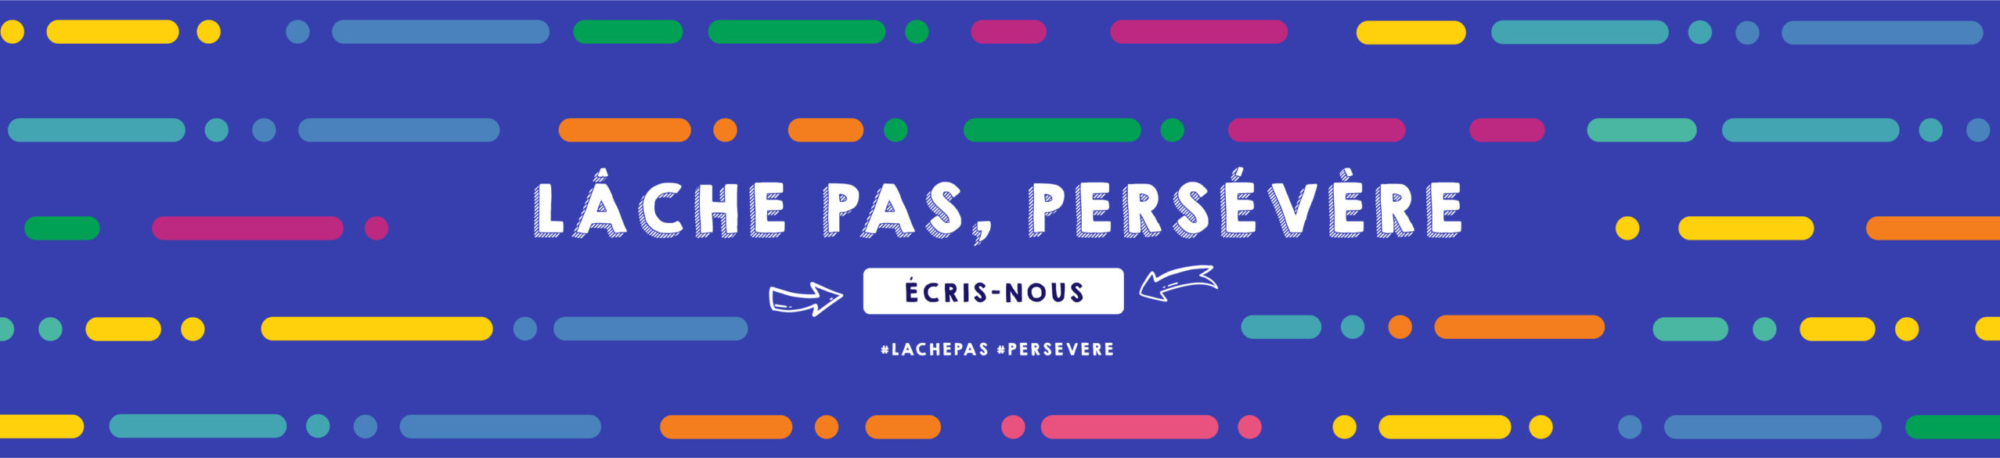 03a-lachepaspersevere_fr